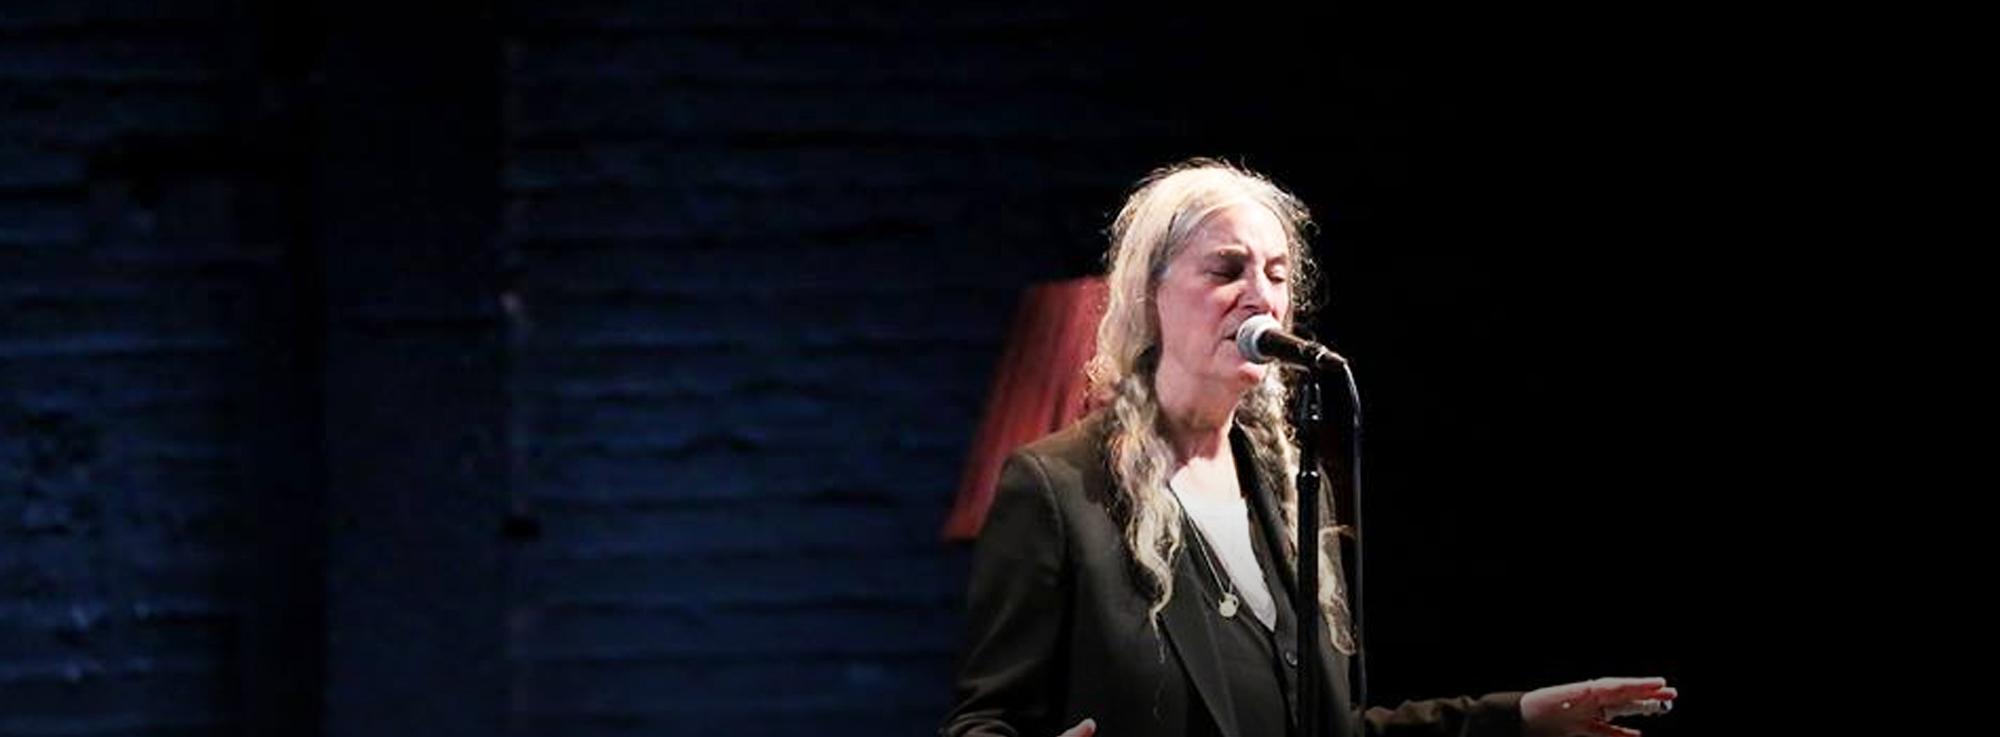 Taranto: Patti Smith al Medimex